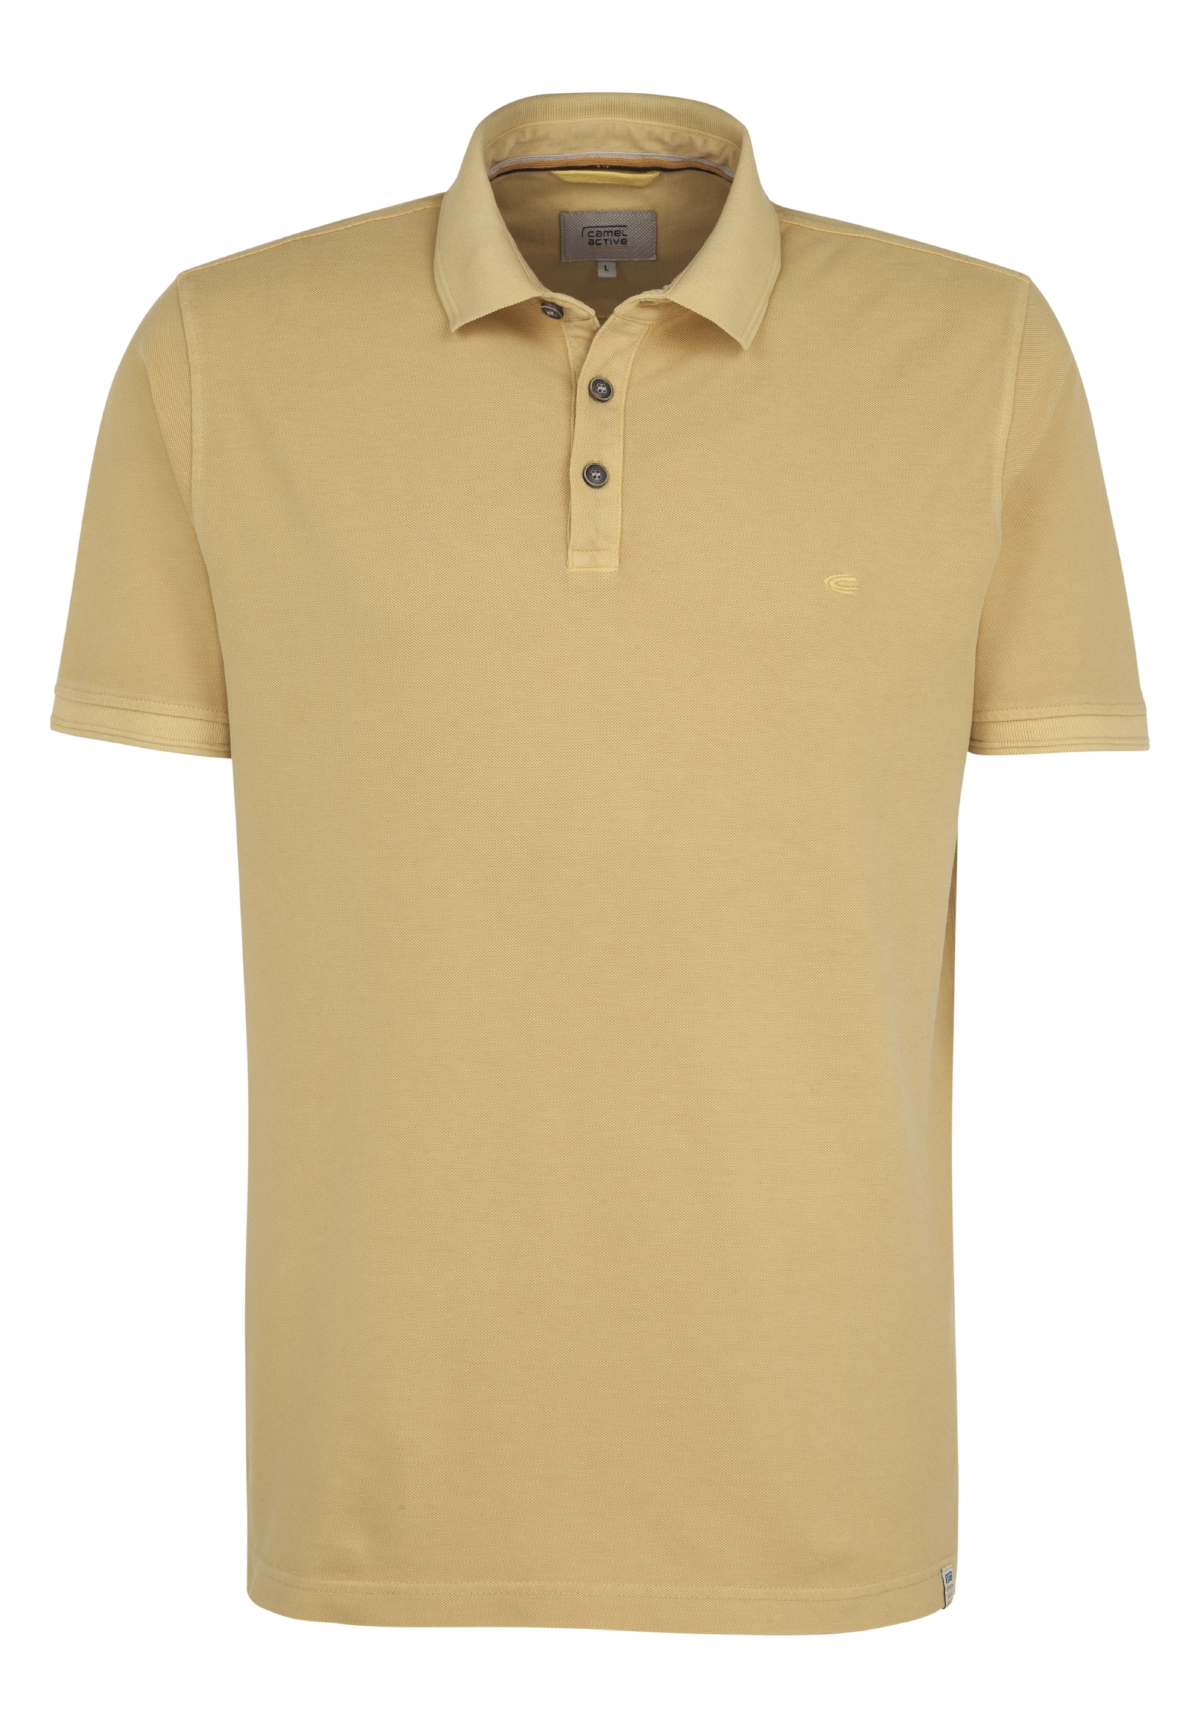 Camel-Active-Herren-Shirt-Poloshirt-Pique-Regular-Fit-NEU Indexbild 72